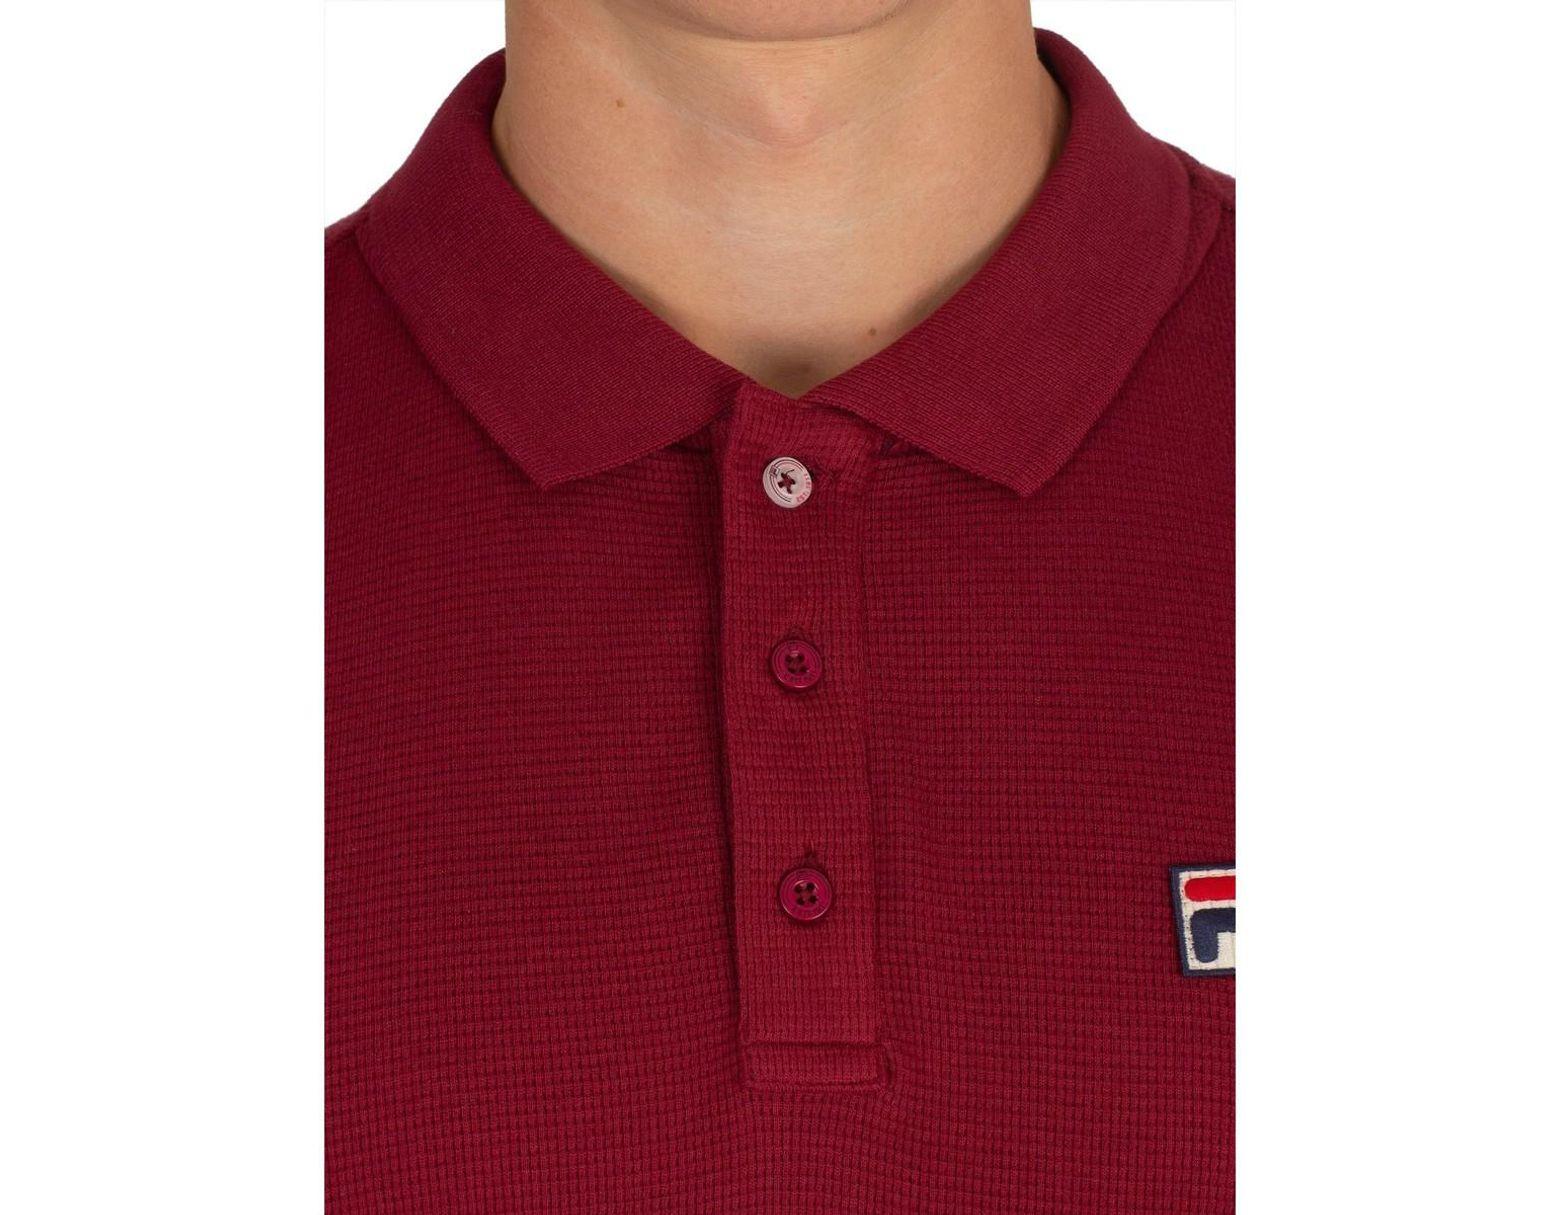 87d70bb0 Fila Men's Bertoni Essential Longsleeved Slim Poloshirt, Red Men's ...